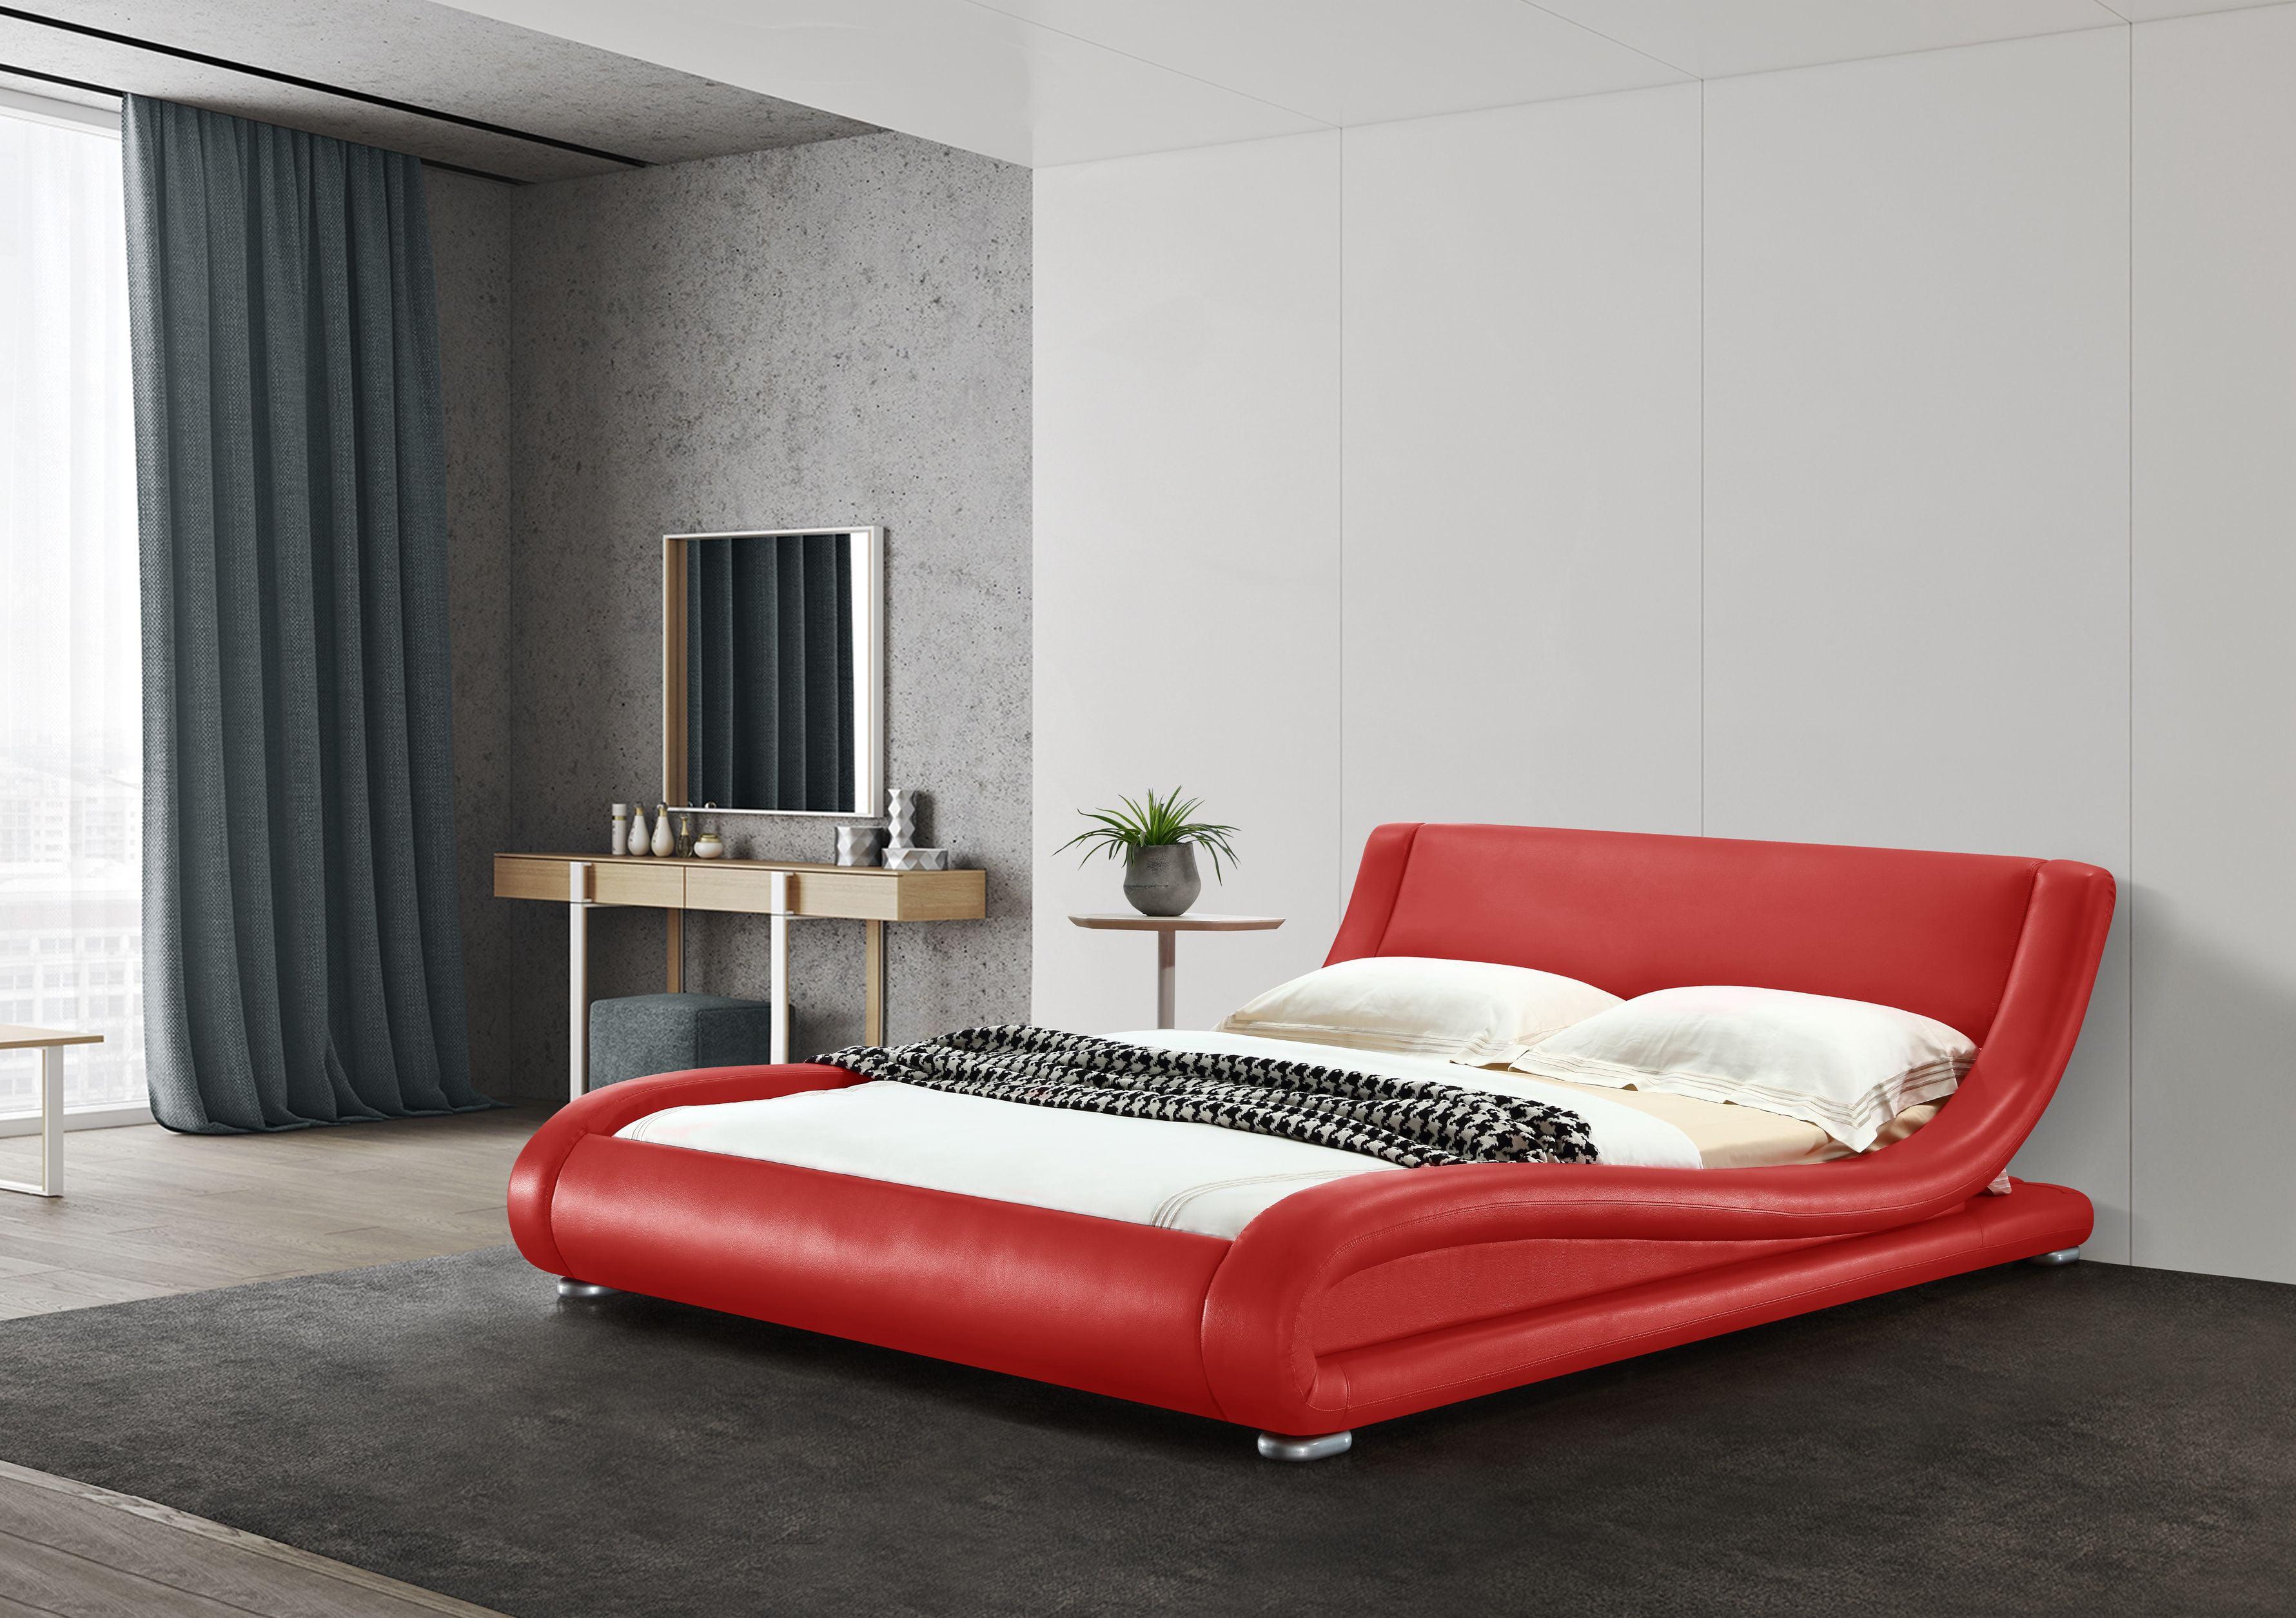 Greatime B1070 Contemporary Upholstered Platform Bed Full Red Walmart Com Walmart Com